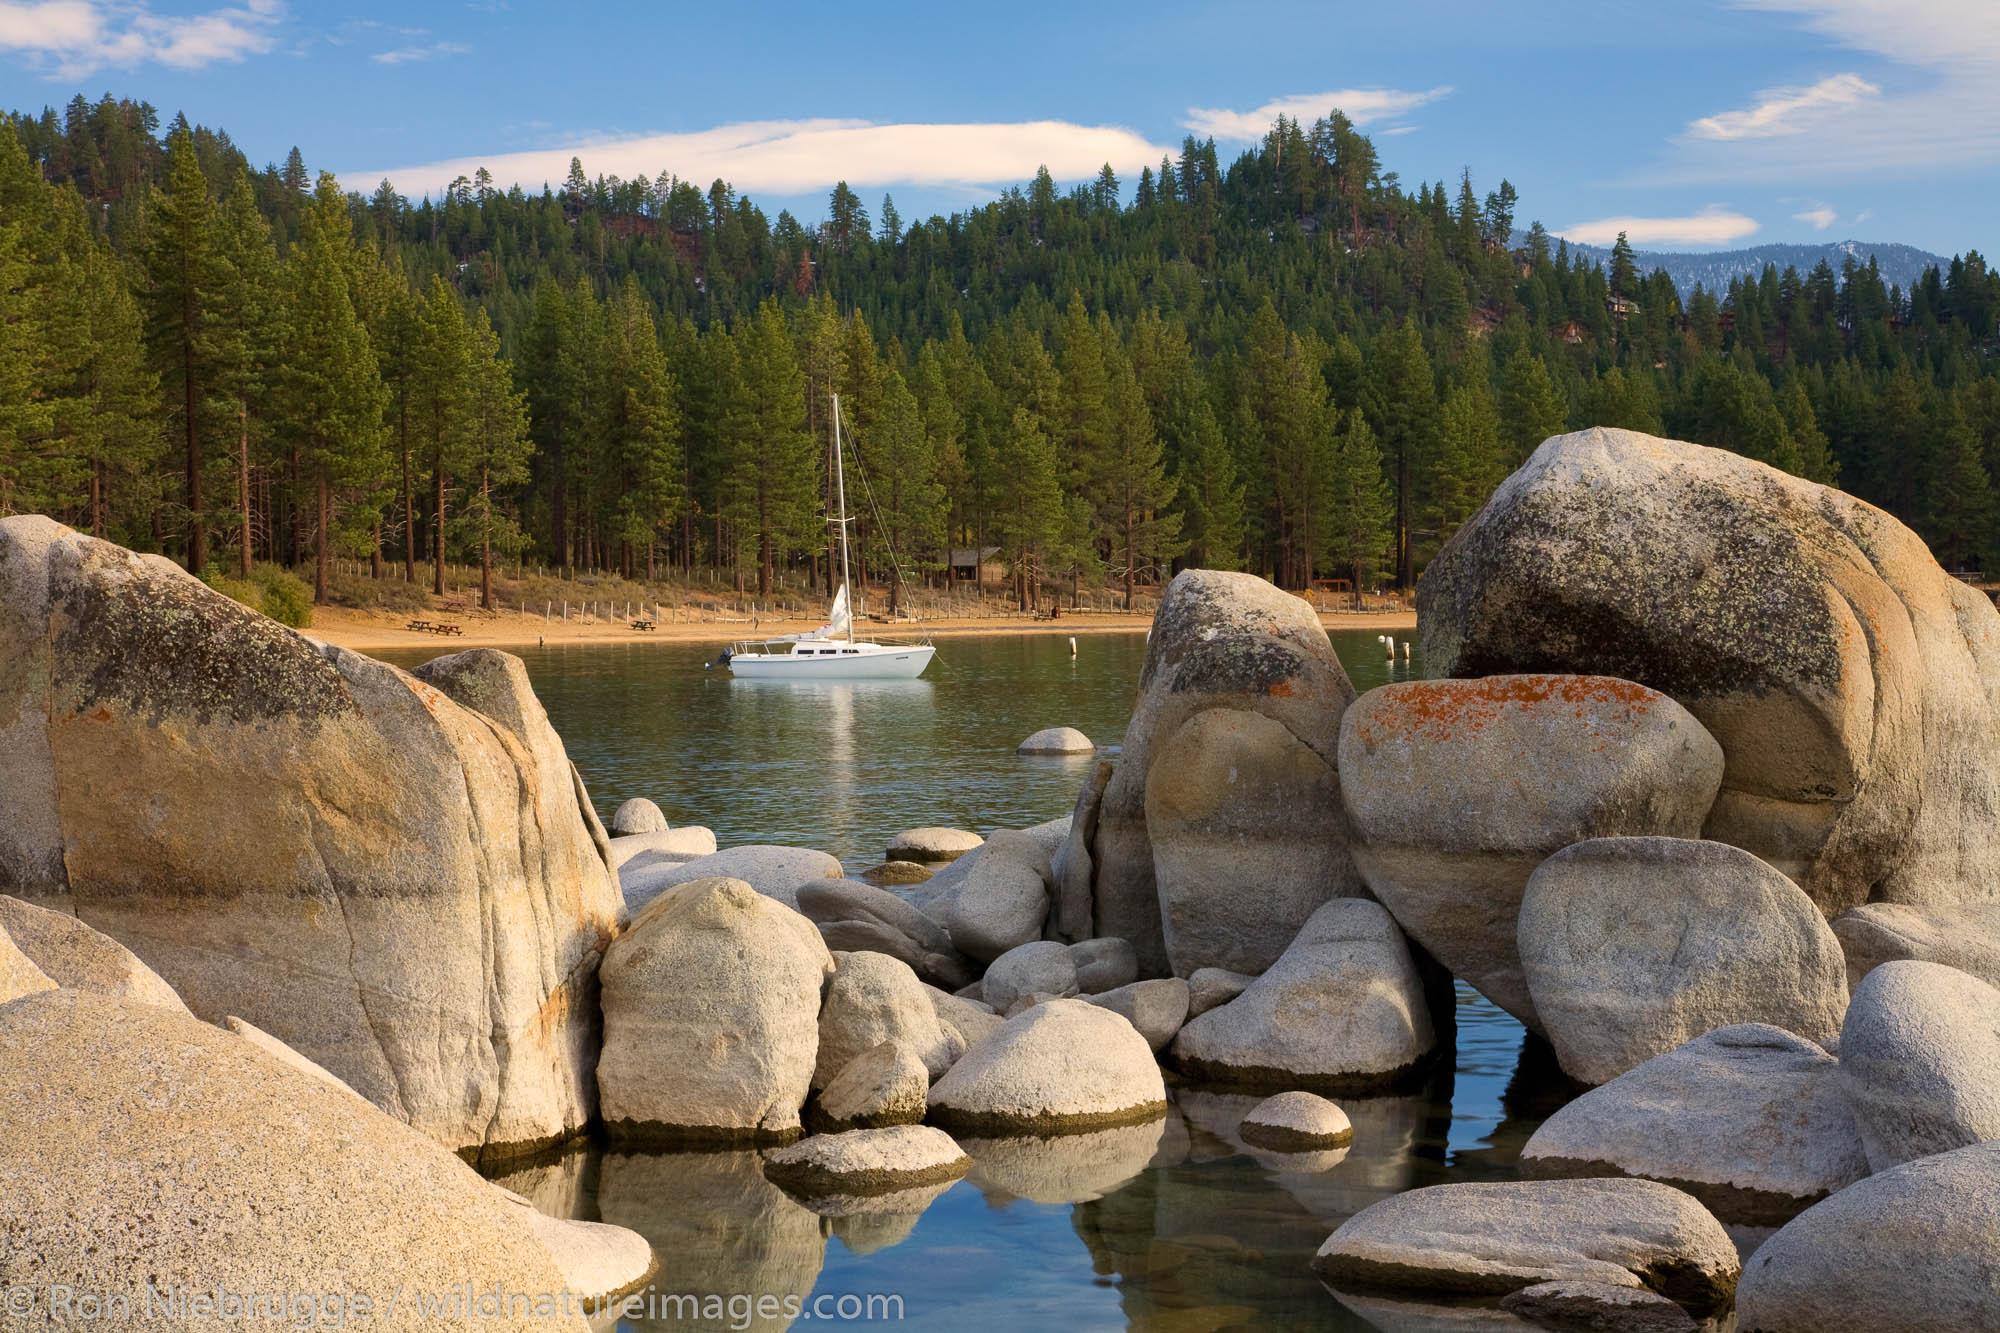 A sailboat in Zephyr Cove, Lake Tahoe, Nevada.